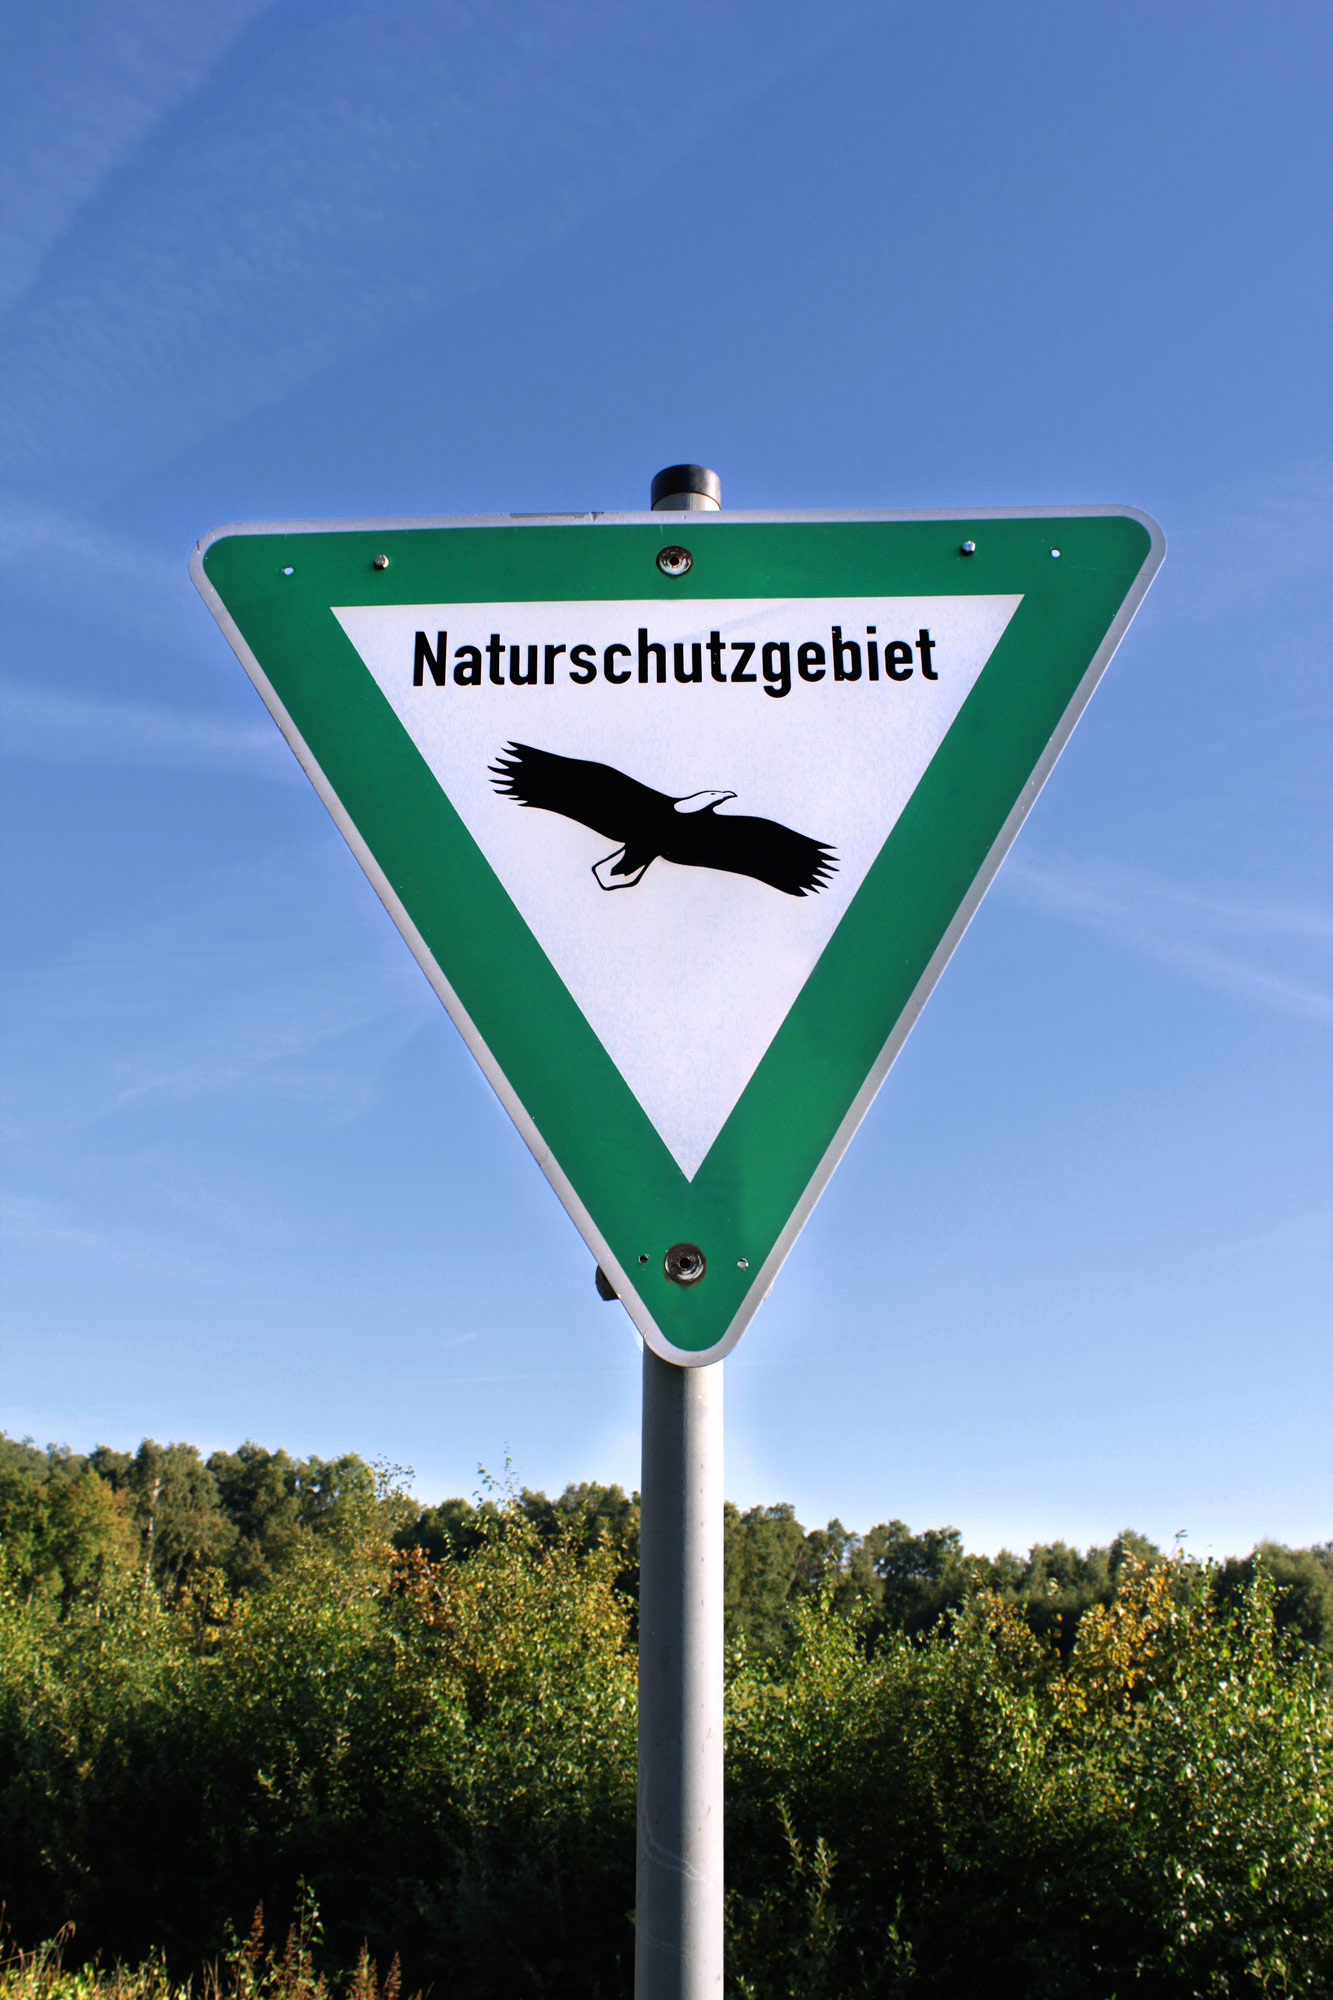 Naturschutzgebiet Schild